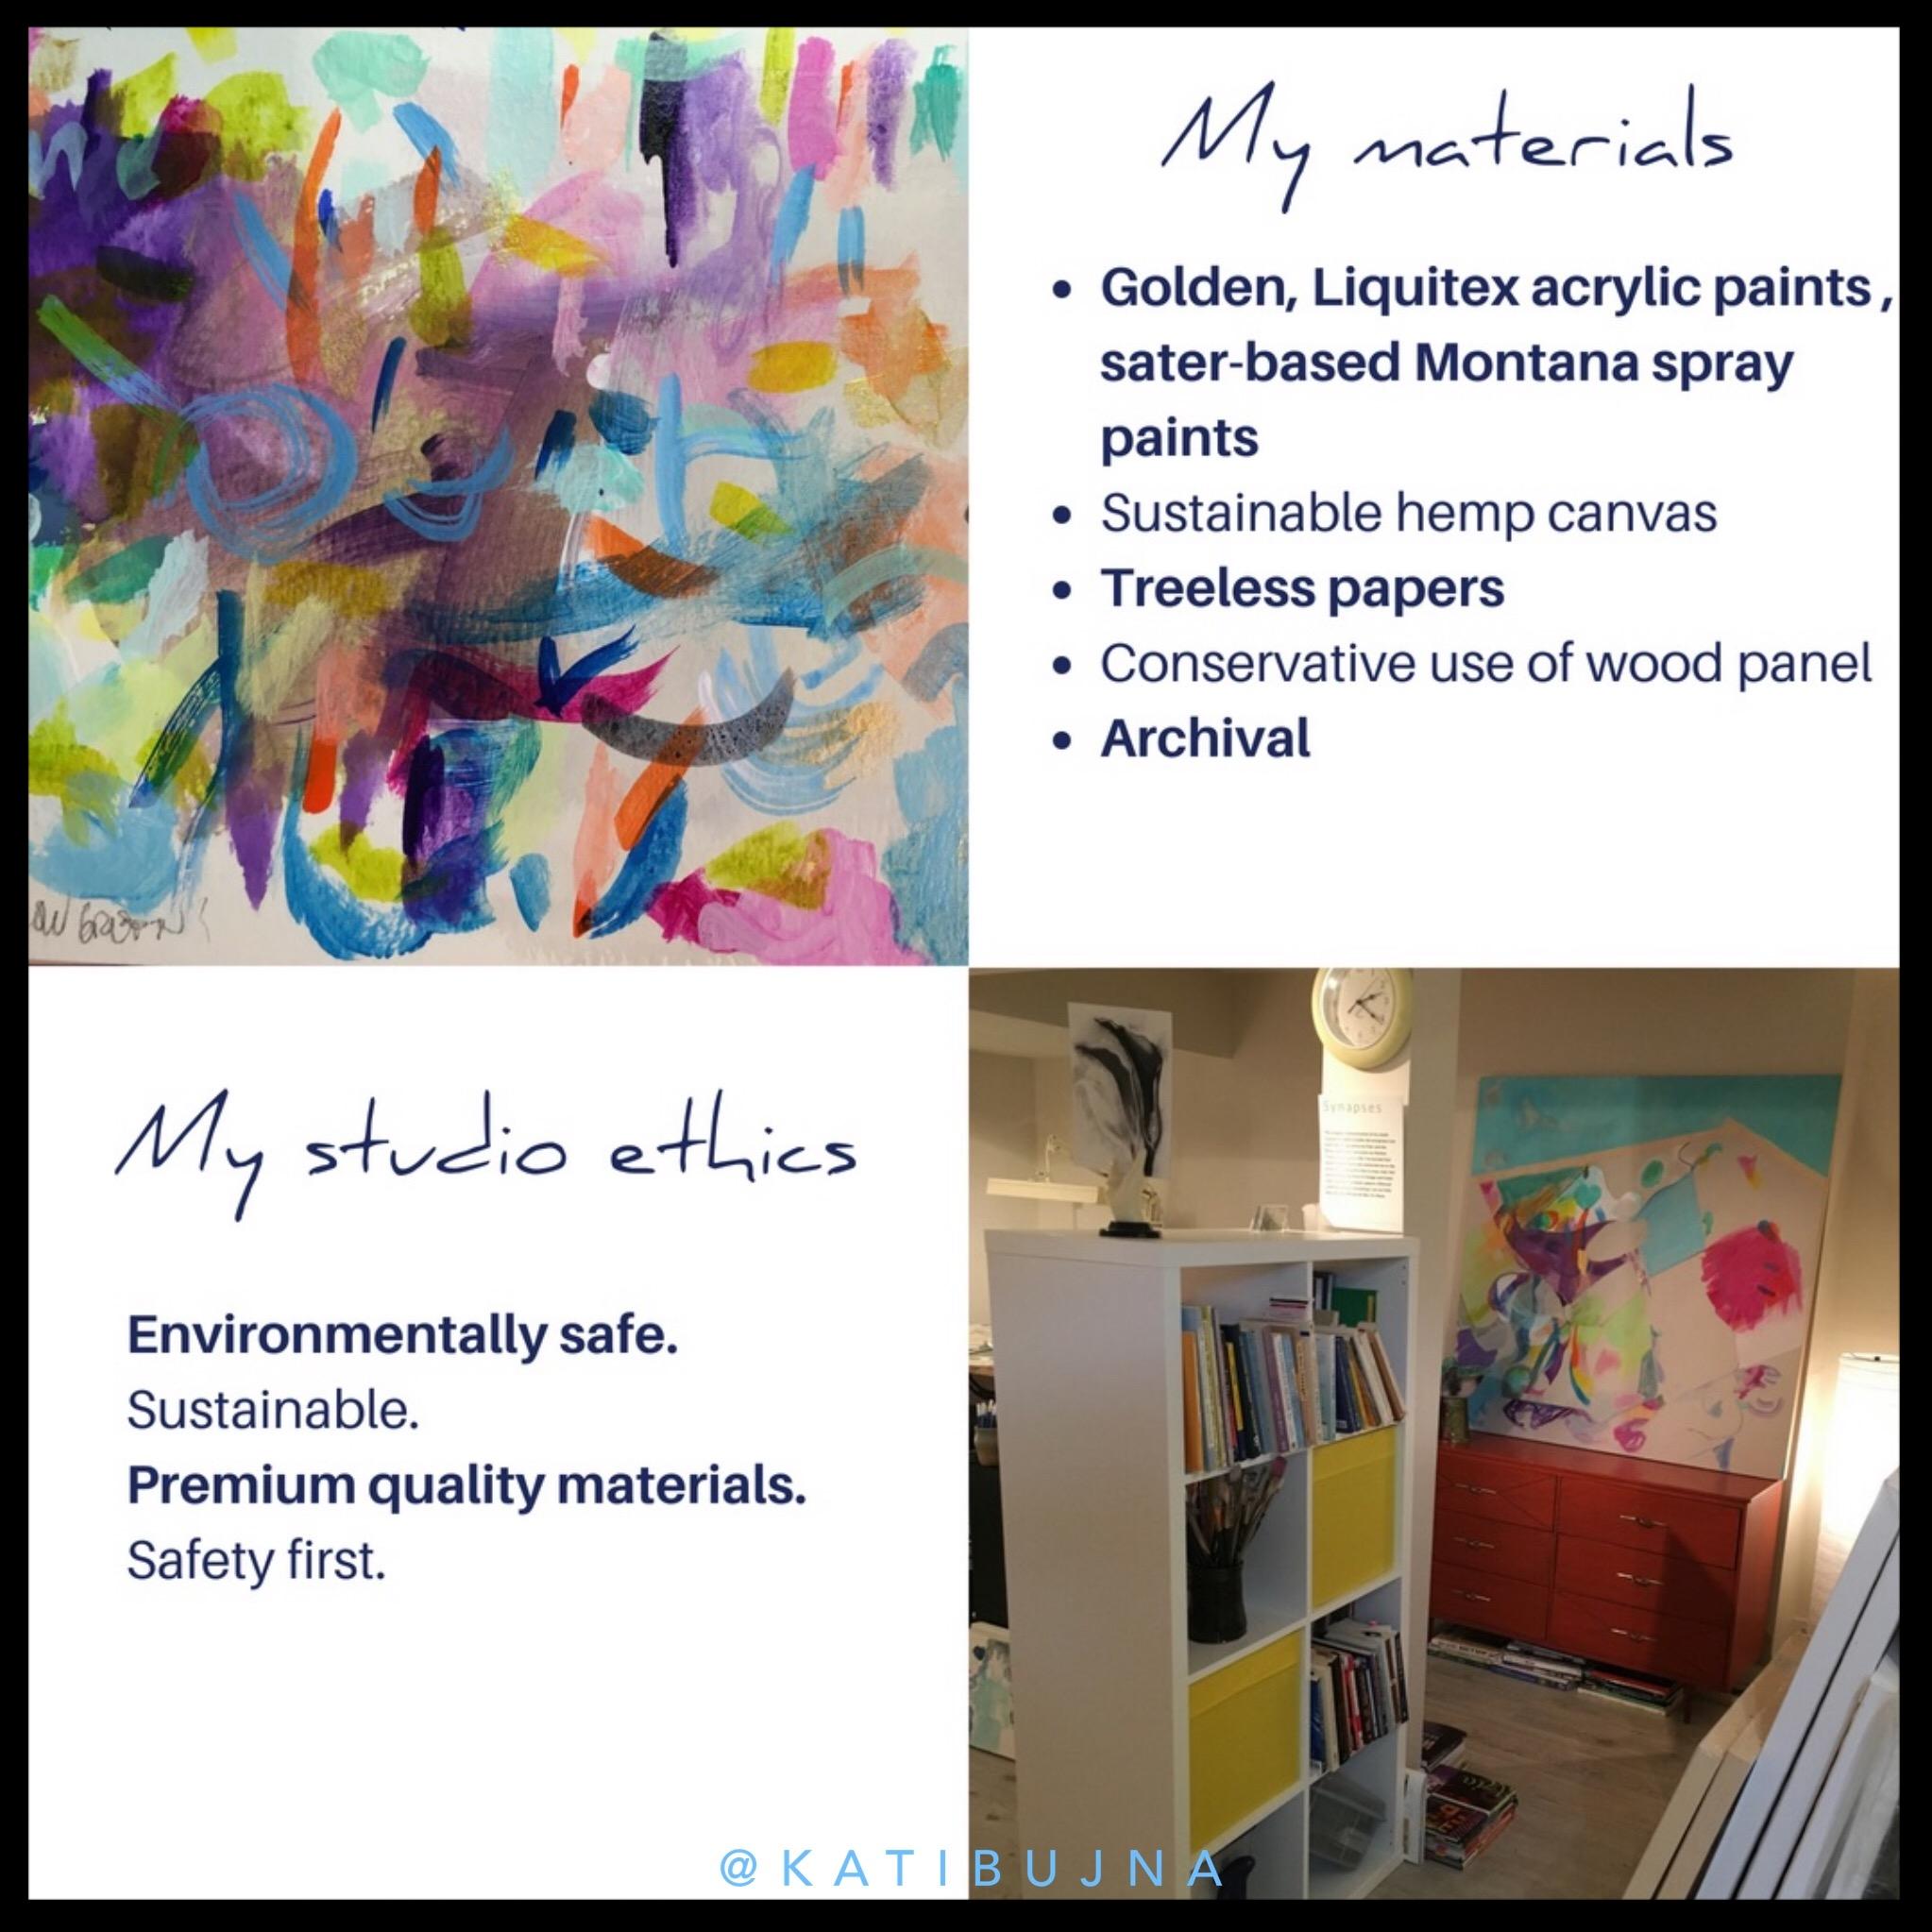 Kati-Bujna-My-Art-Shop-materials.JPG